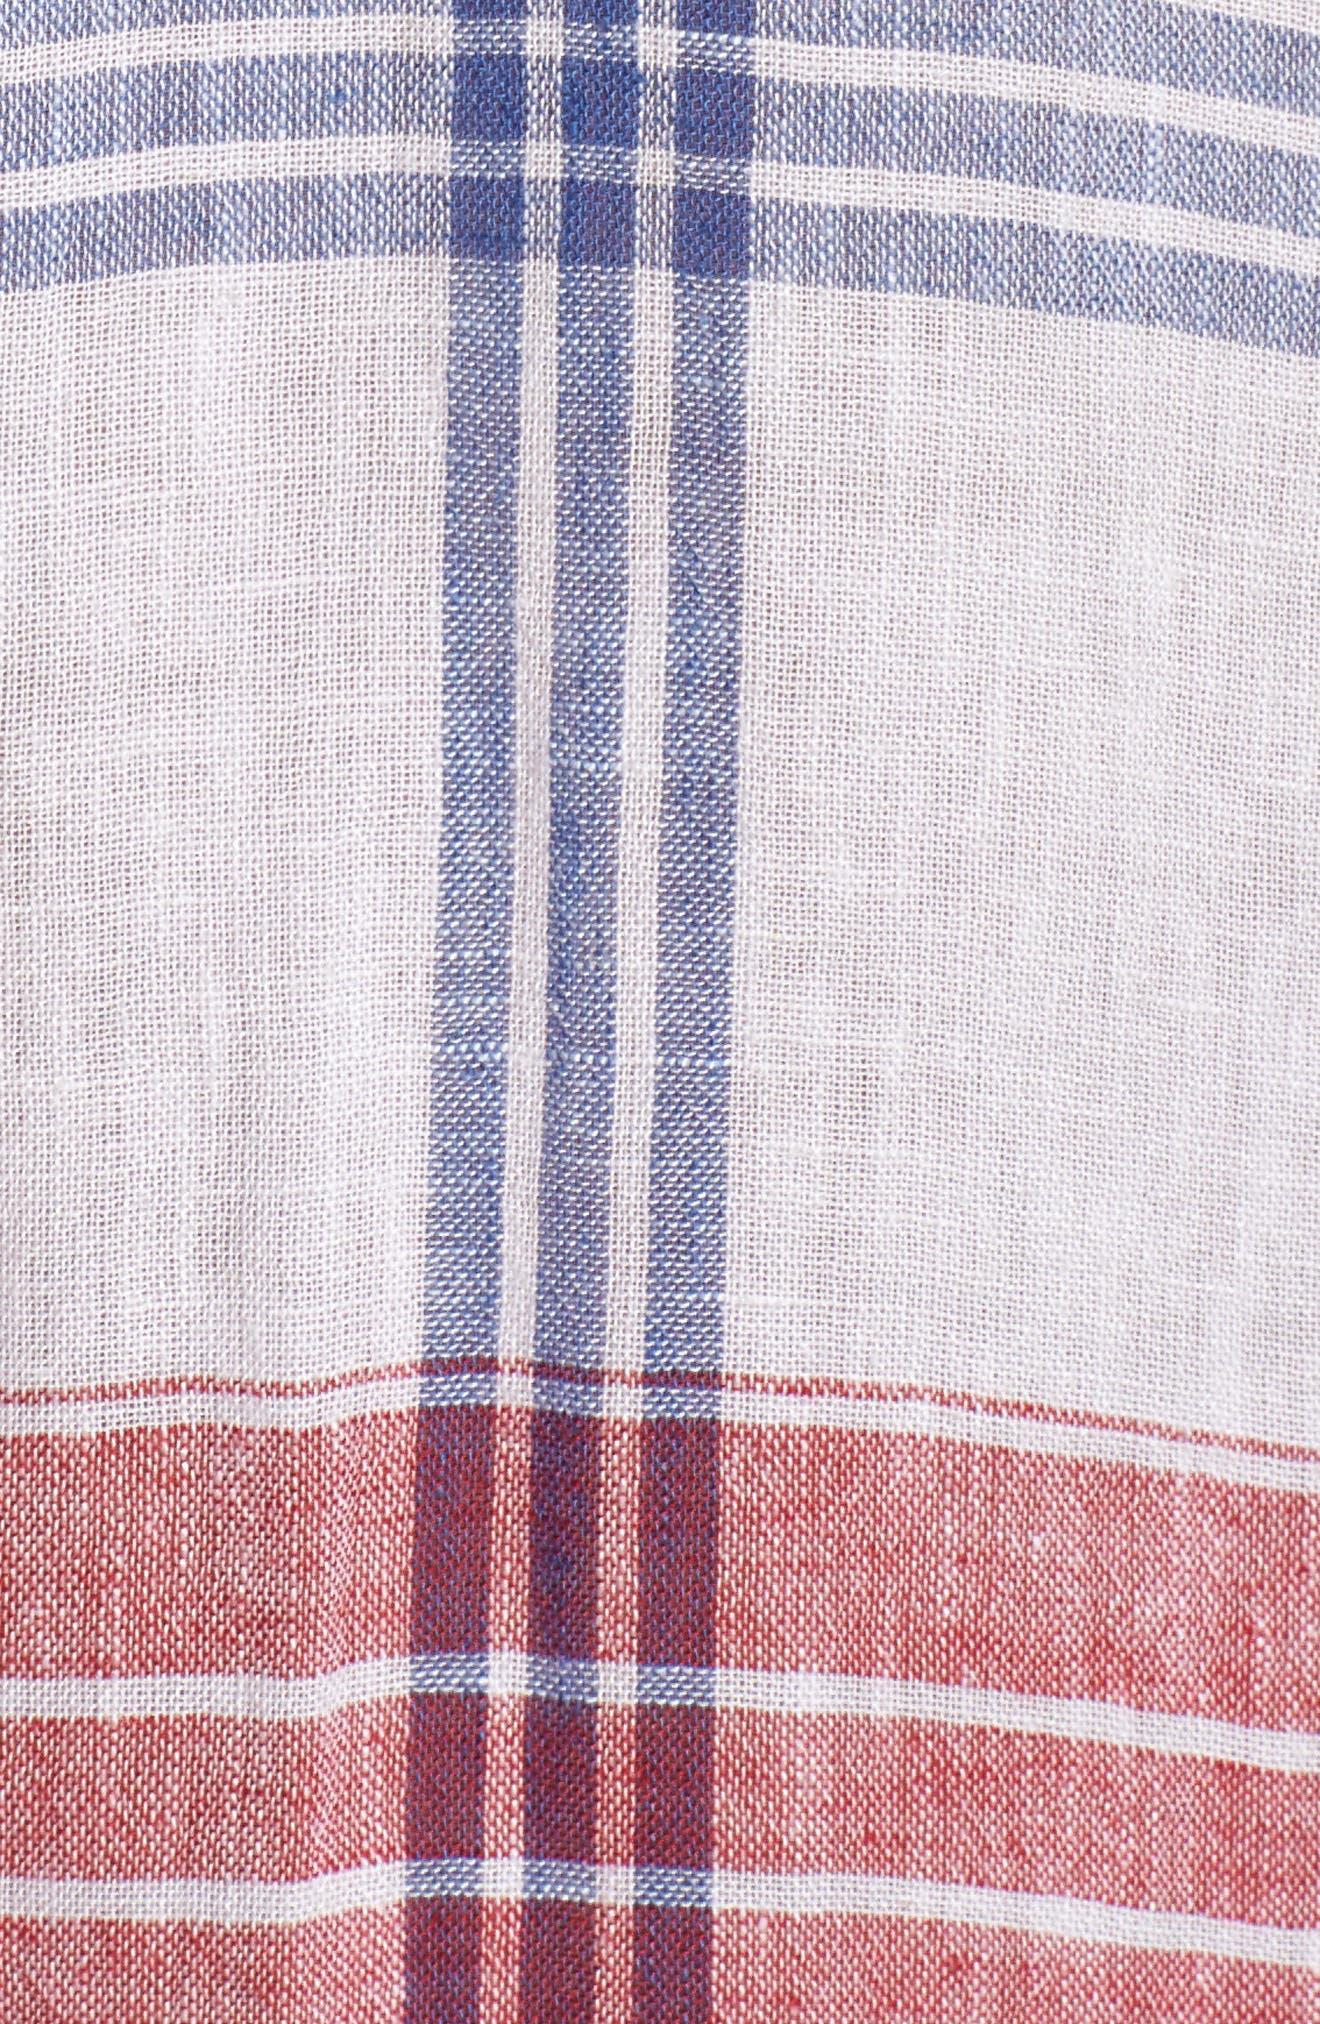 Charli Shirt,                             Alternate thumbnail 6, color,                             CARMINE BLUE WHITE